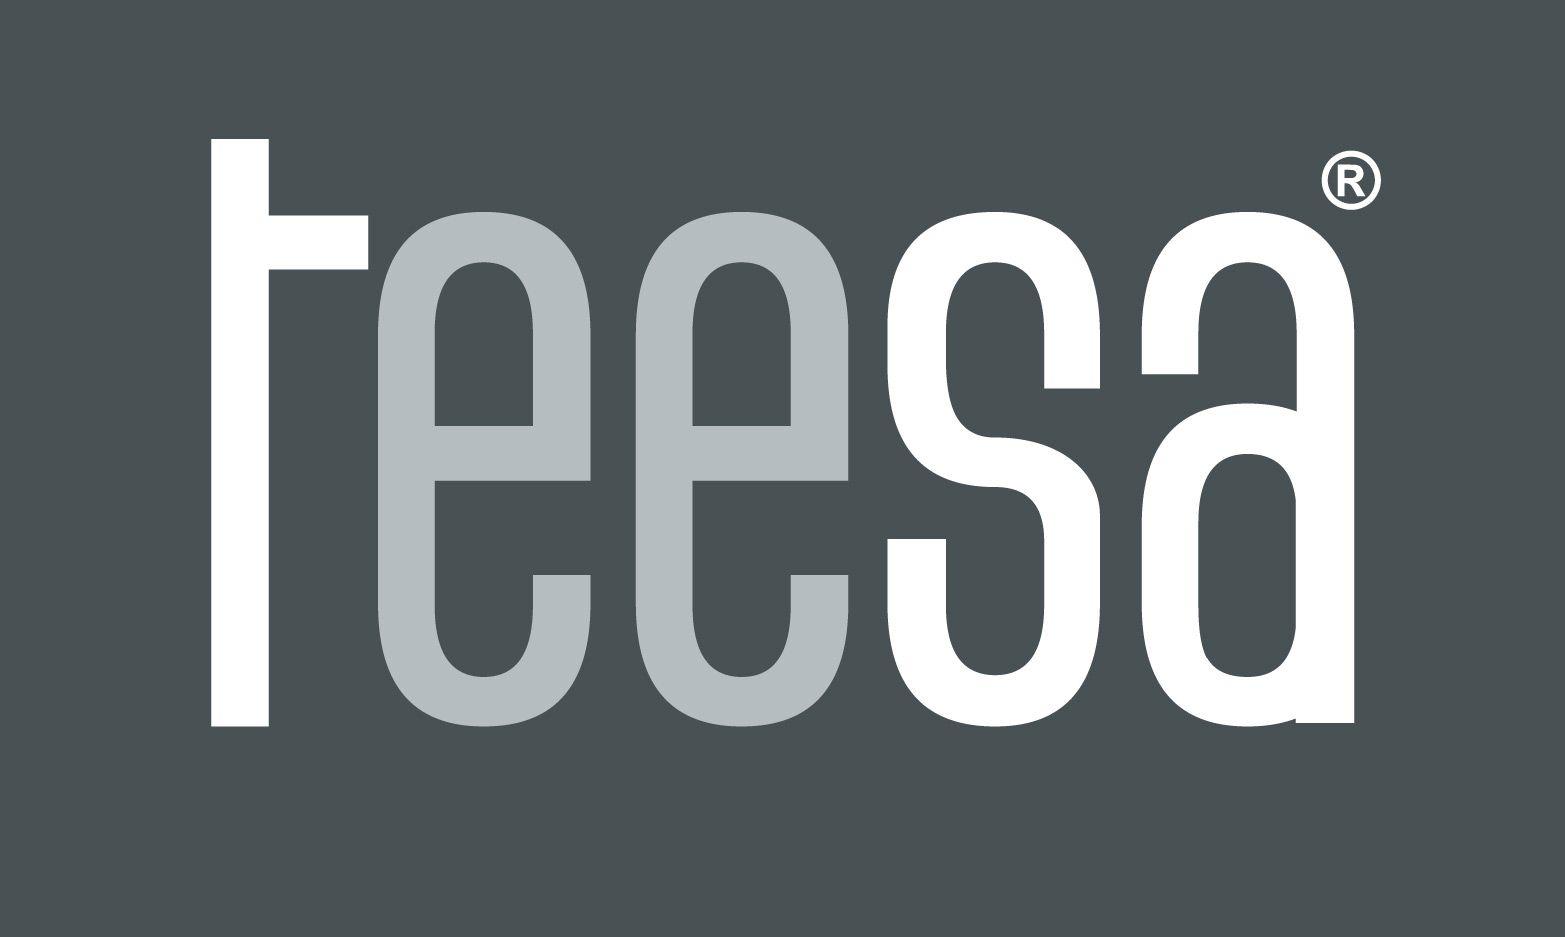 Teesa logo